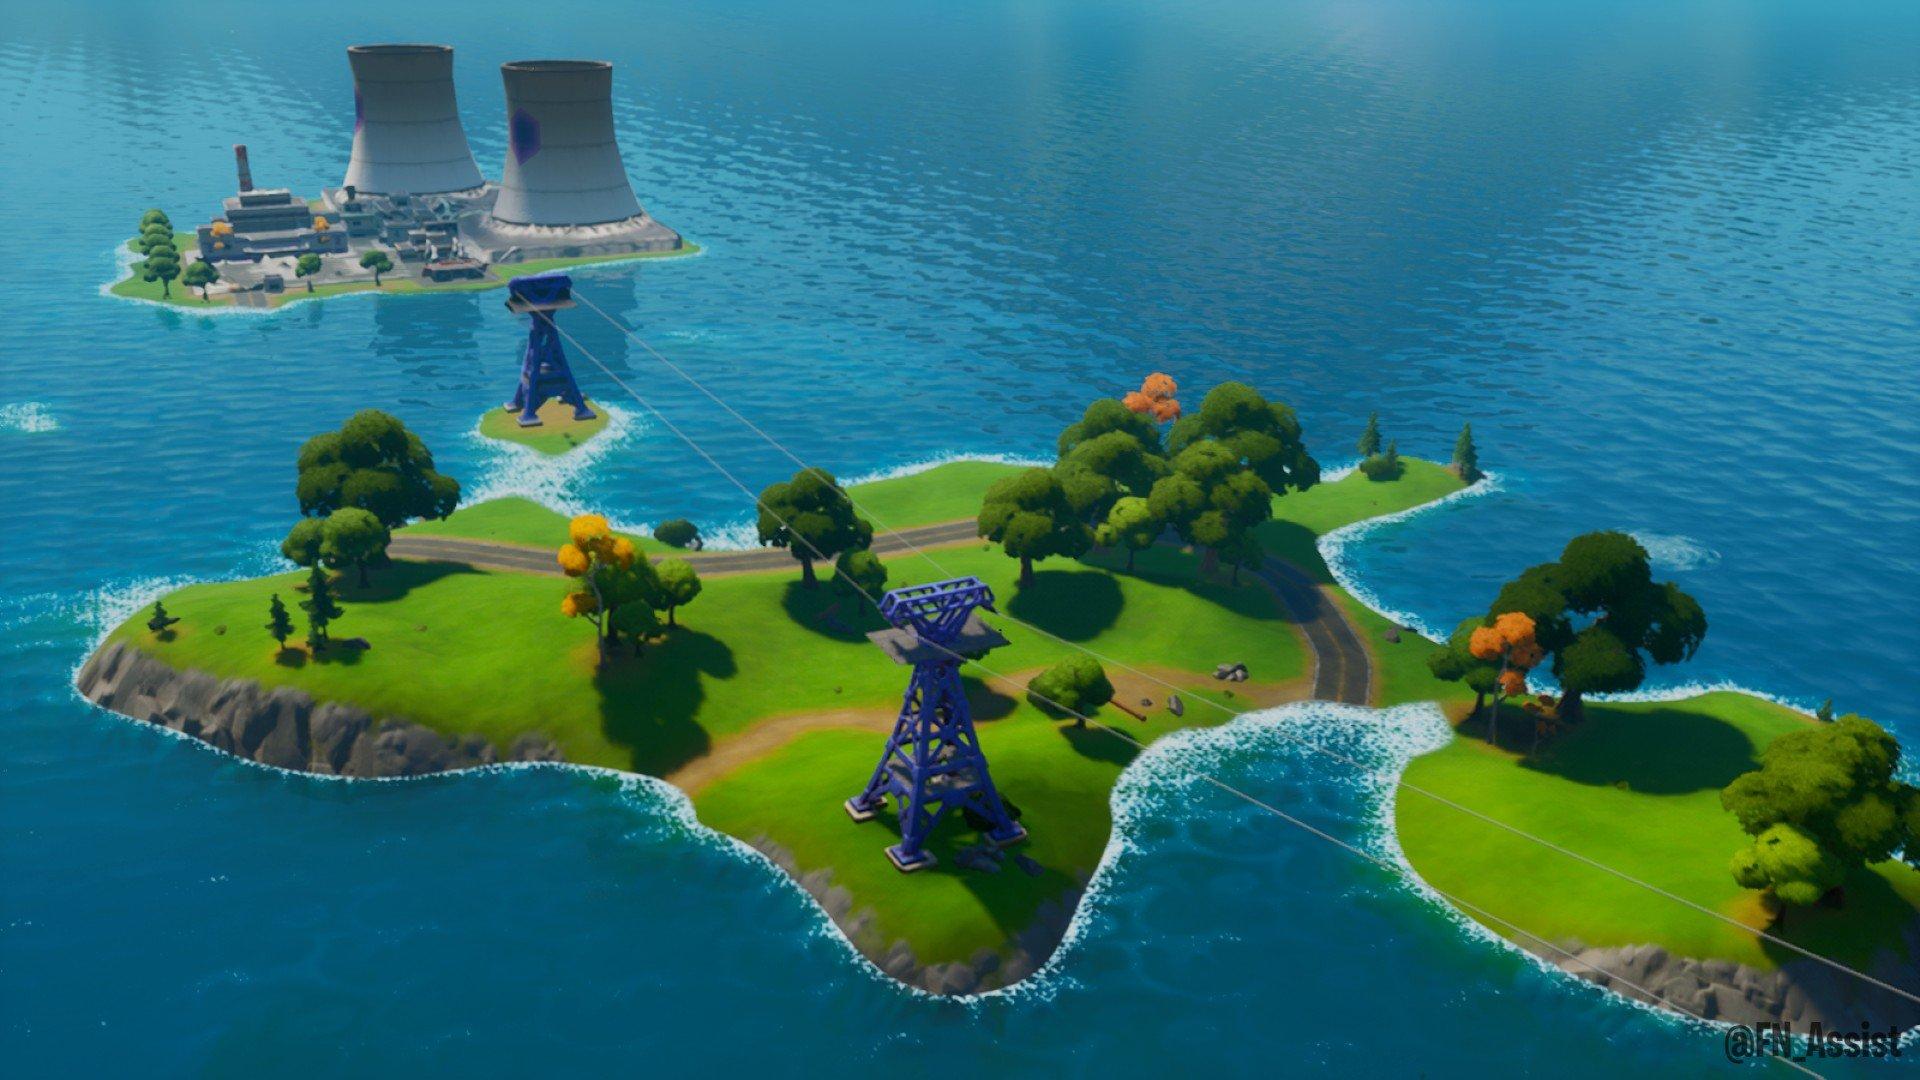 Fortnite Season 3 Map Final Version Leaked Water Level Update Fortnite Insider